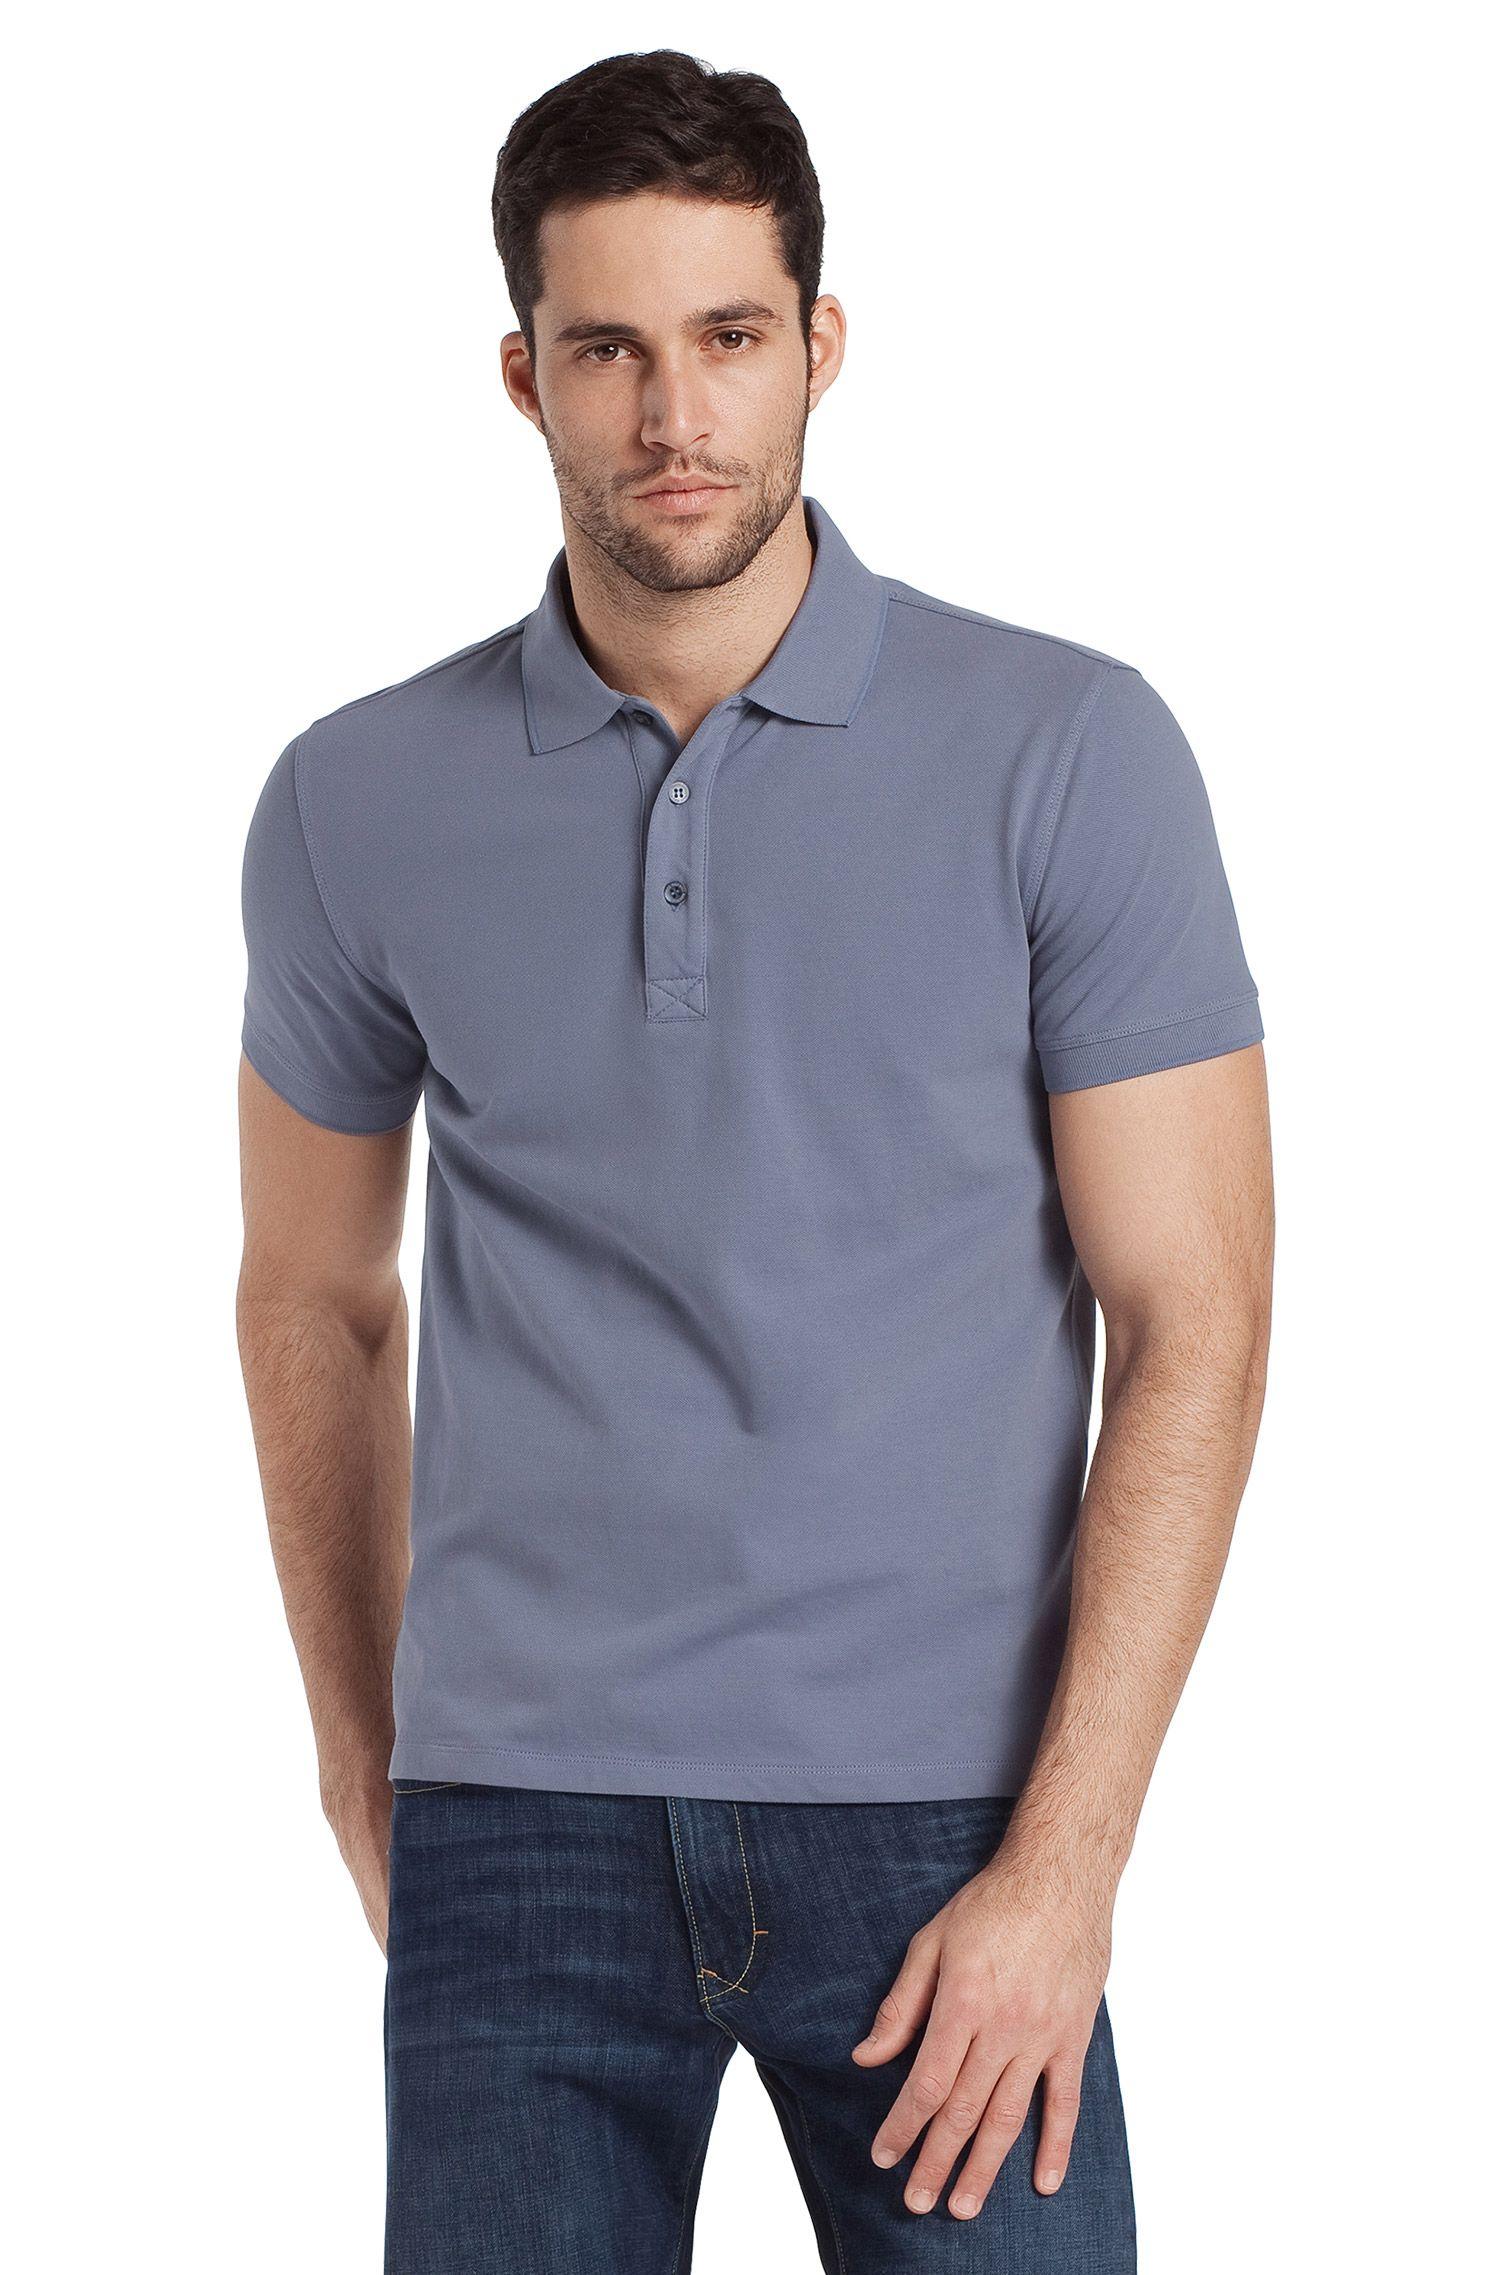 Poloshirt ´Forli` aus Baumwoll-Stretch